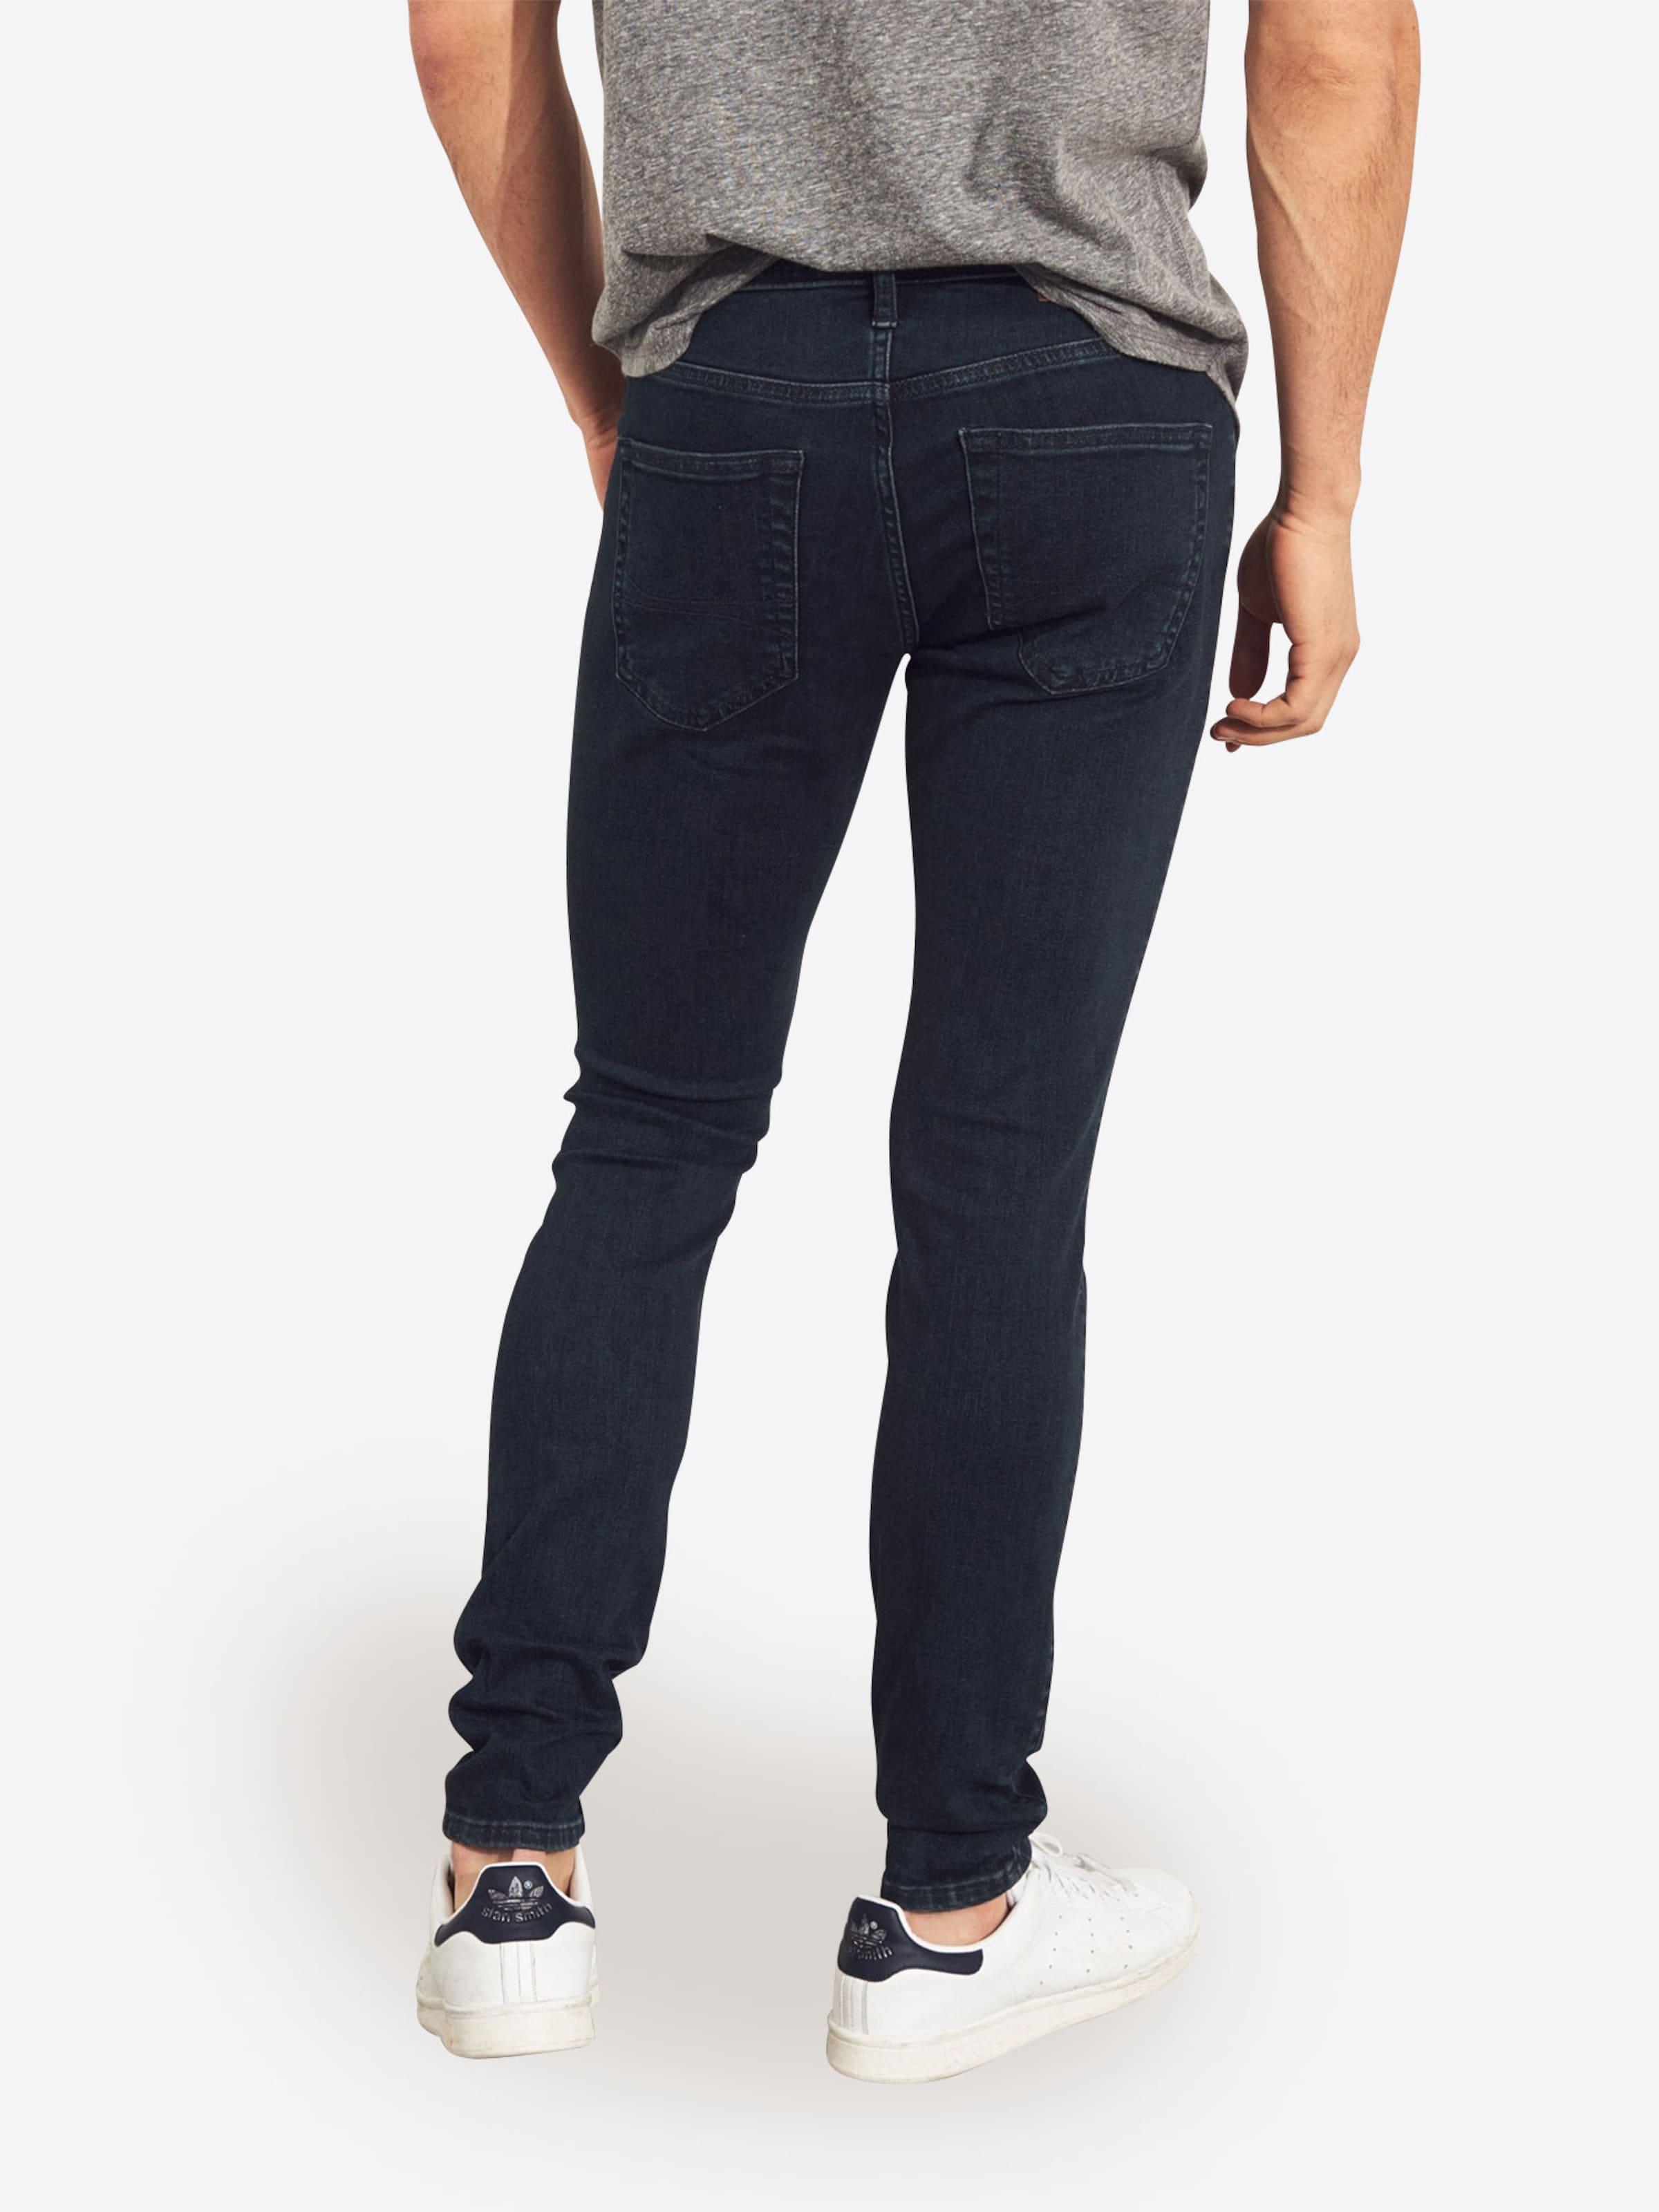 Extreme 'dark Jean Bleu Denim Overdye Skinny' Hollister En b9Ie2YEHWD